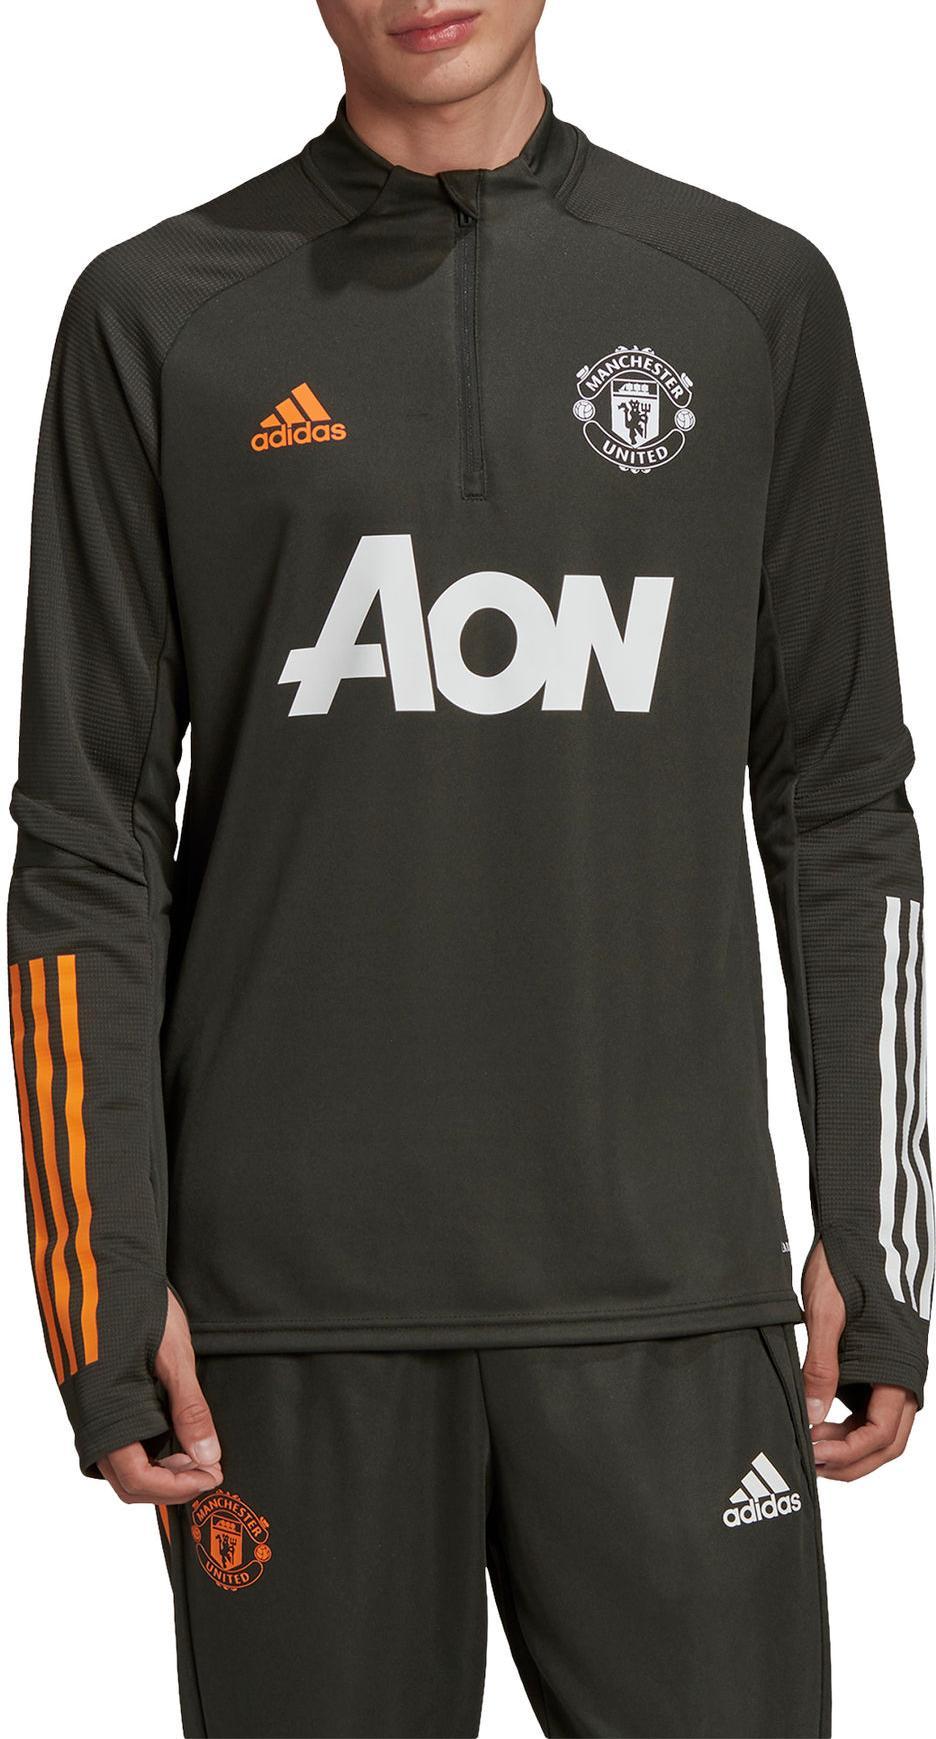 T Shirt Adidas 20 21 Manchester United Training Top Top4football Com